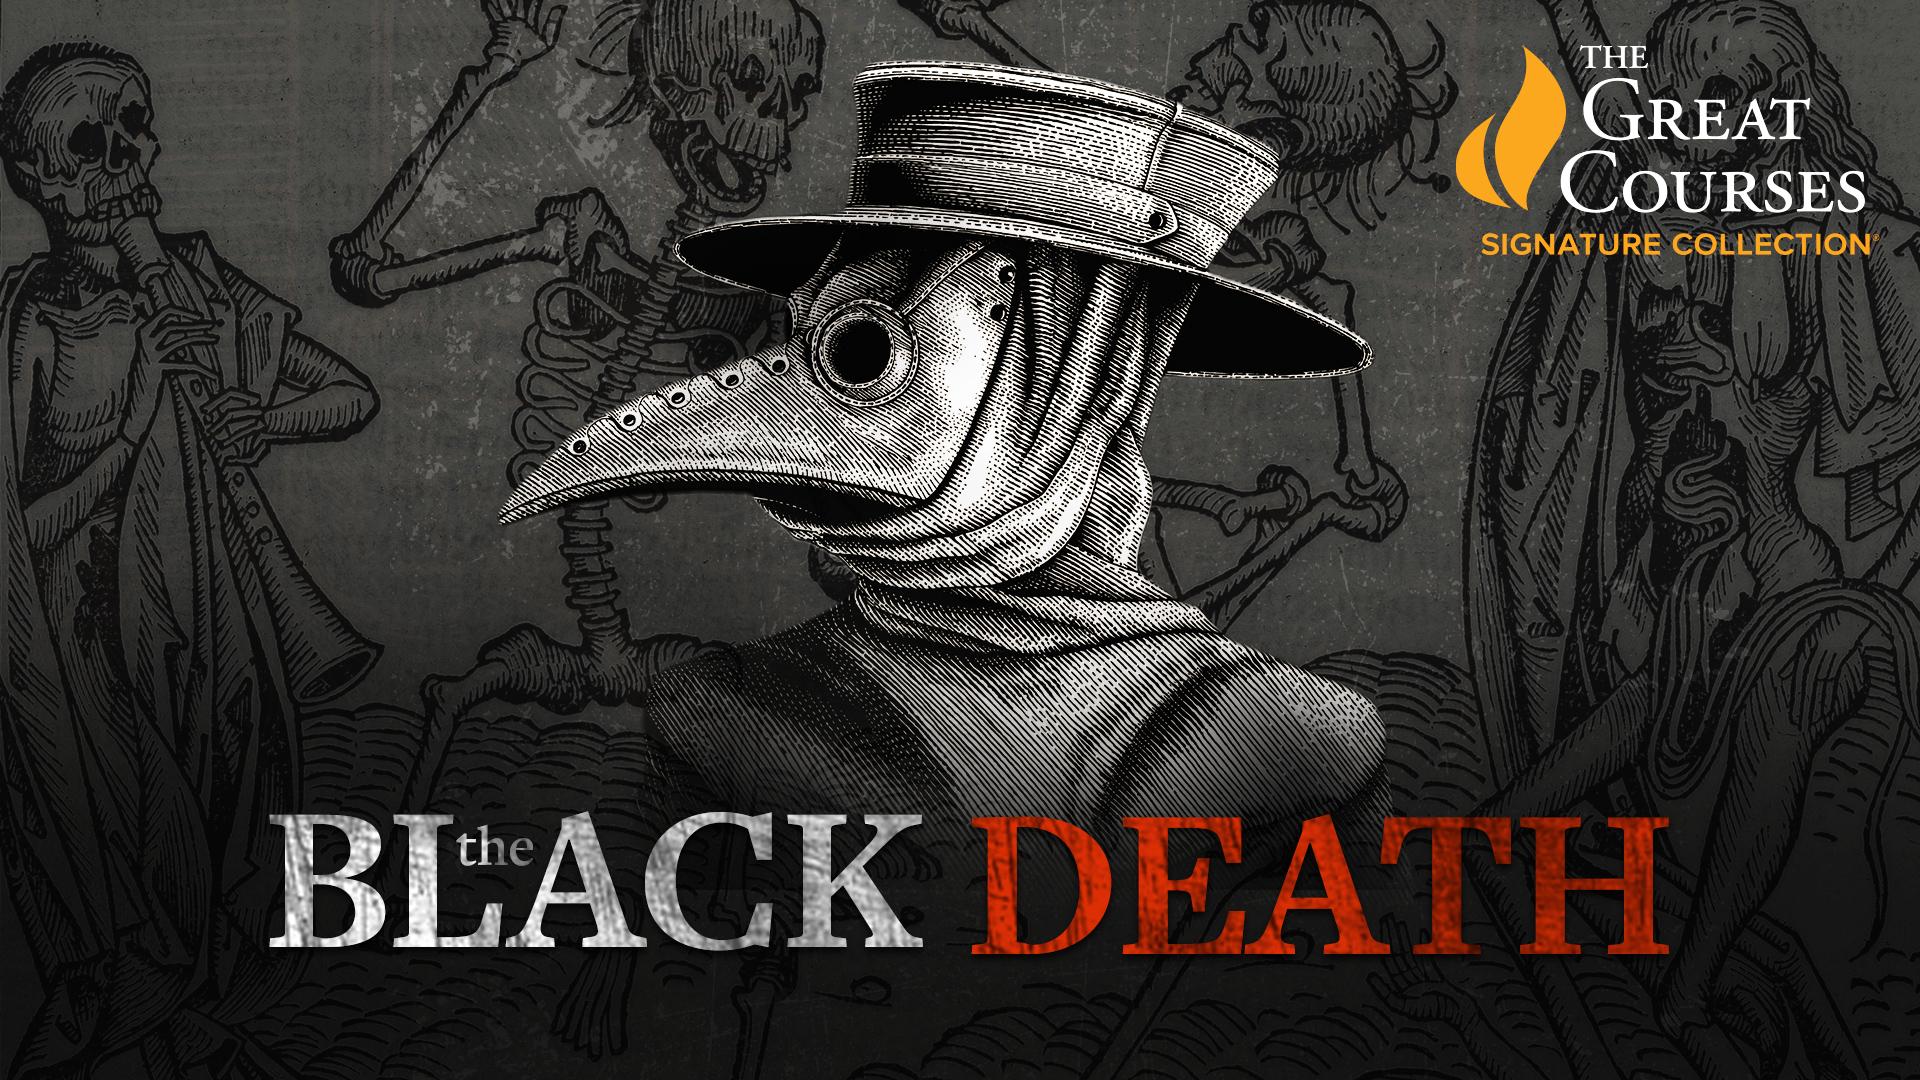 The Black Death: The World's Most Devastating Plague